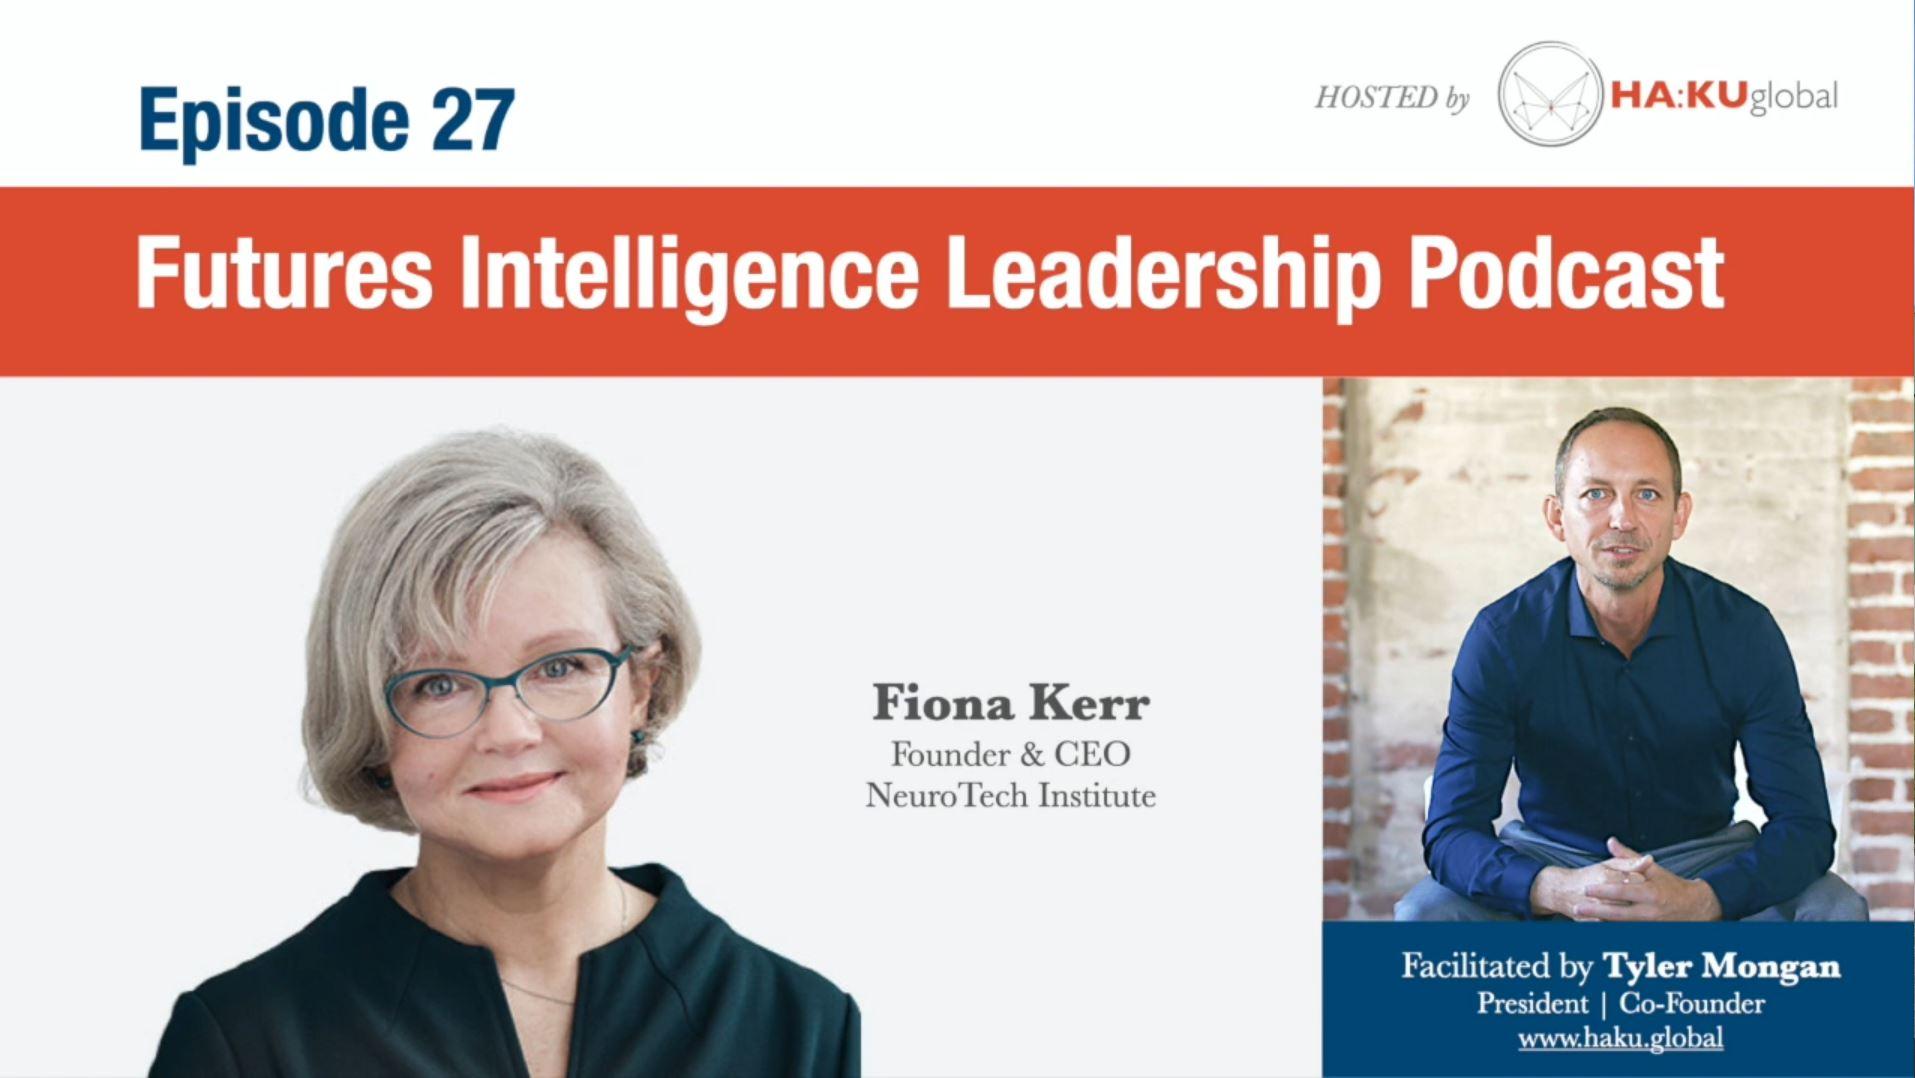 The Futures Intelligence Leadership Podcast